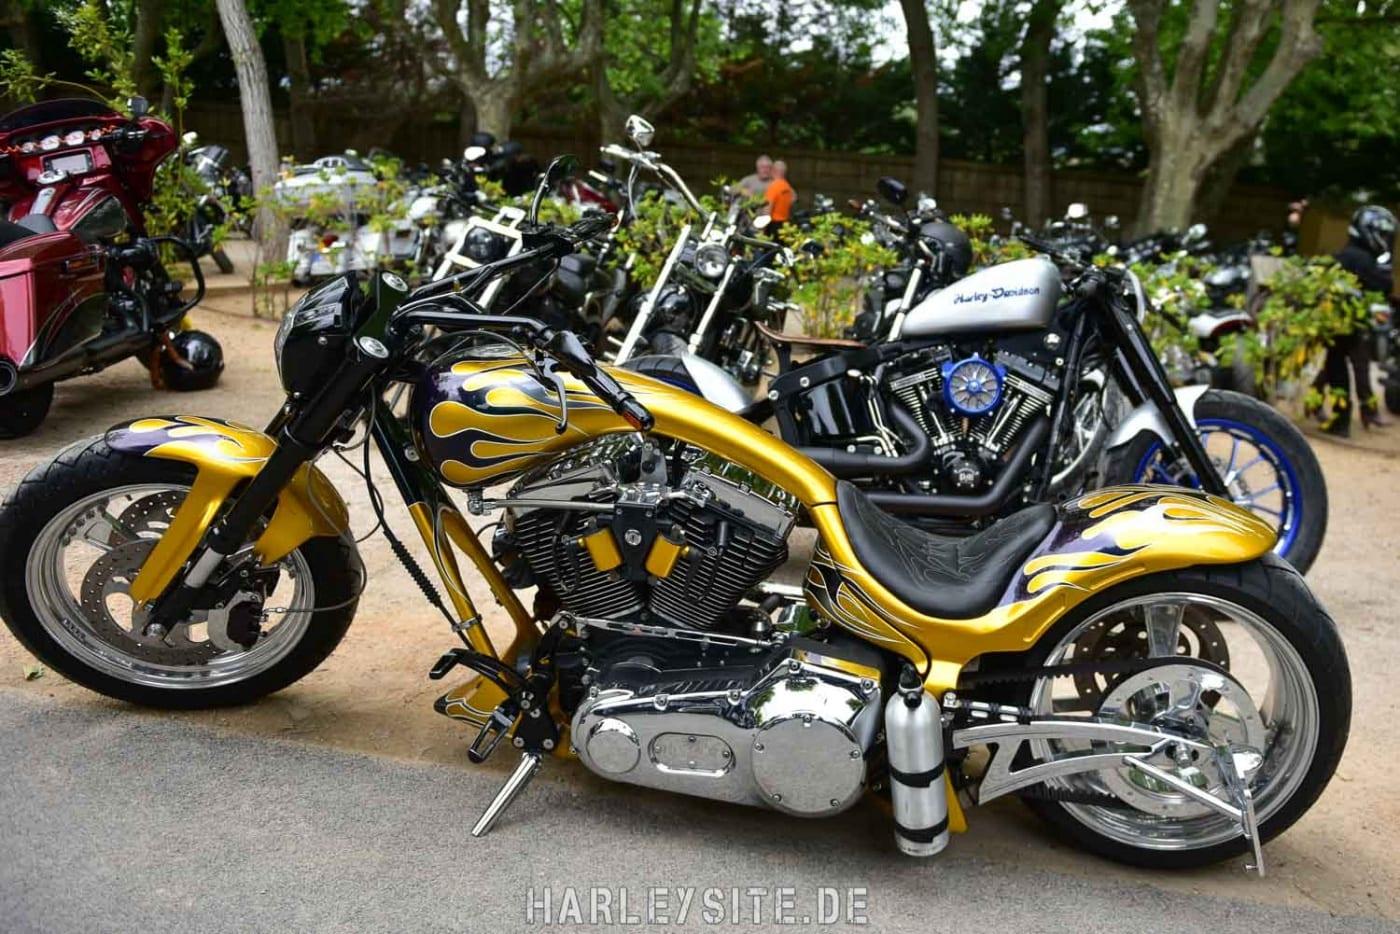 Custombike Saint Tropez Harley Davidson Event 8558